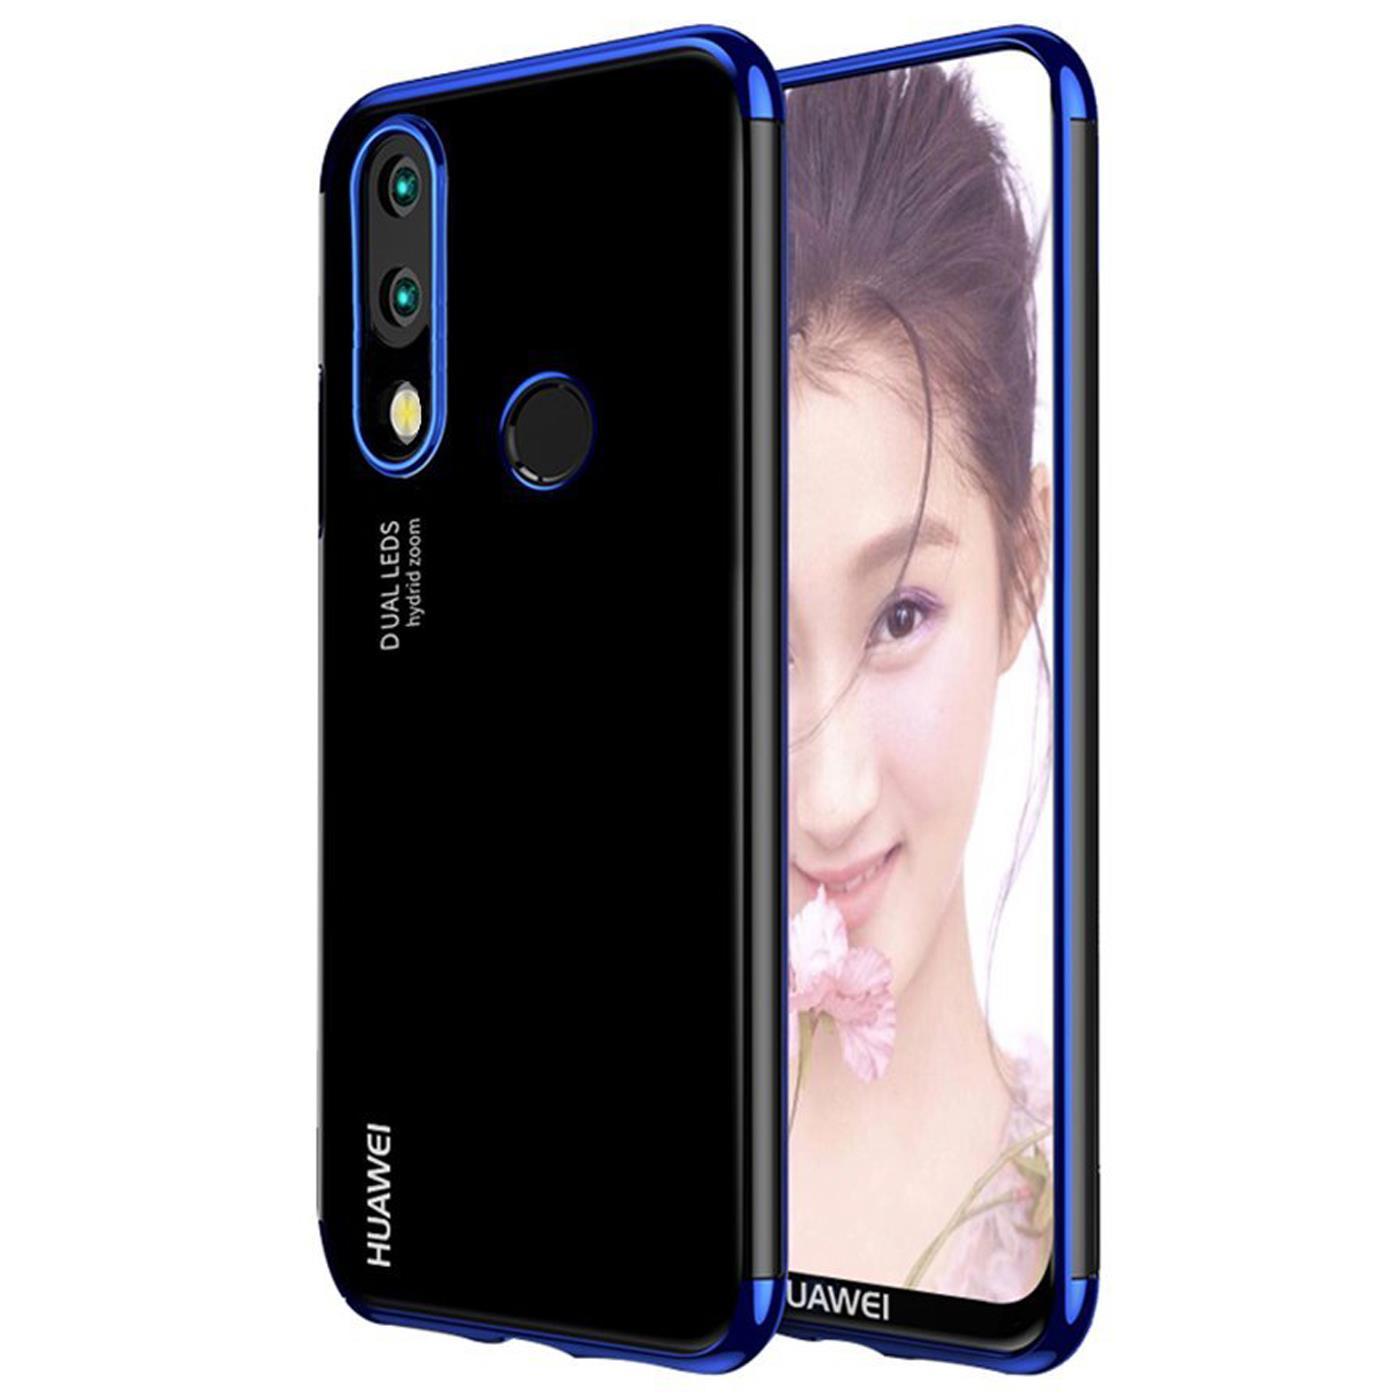 Silikon-Klar-Case-fuer-Huawei-p20-Lite-Ultra-Slim-Stossfeste-Gel-Rueckseite Indexbild 16